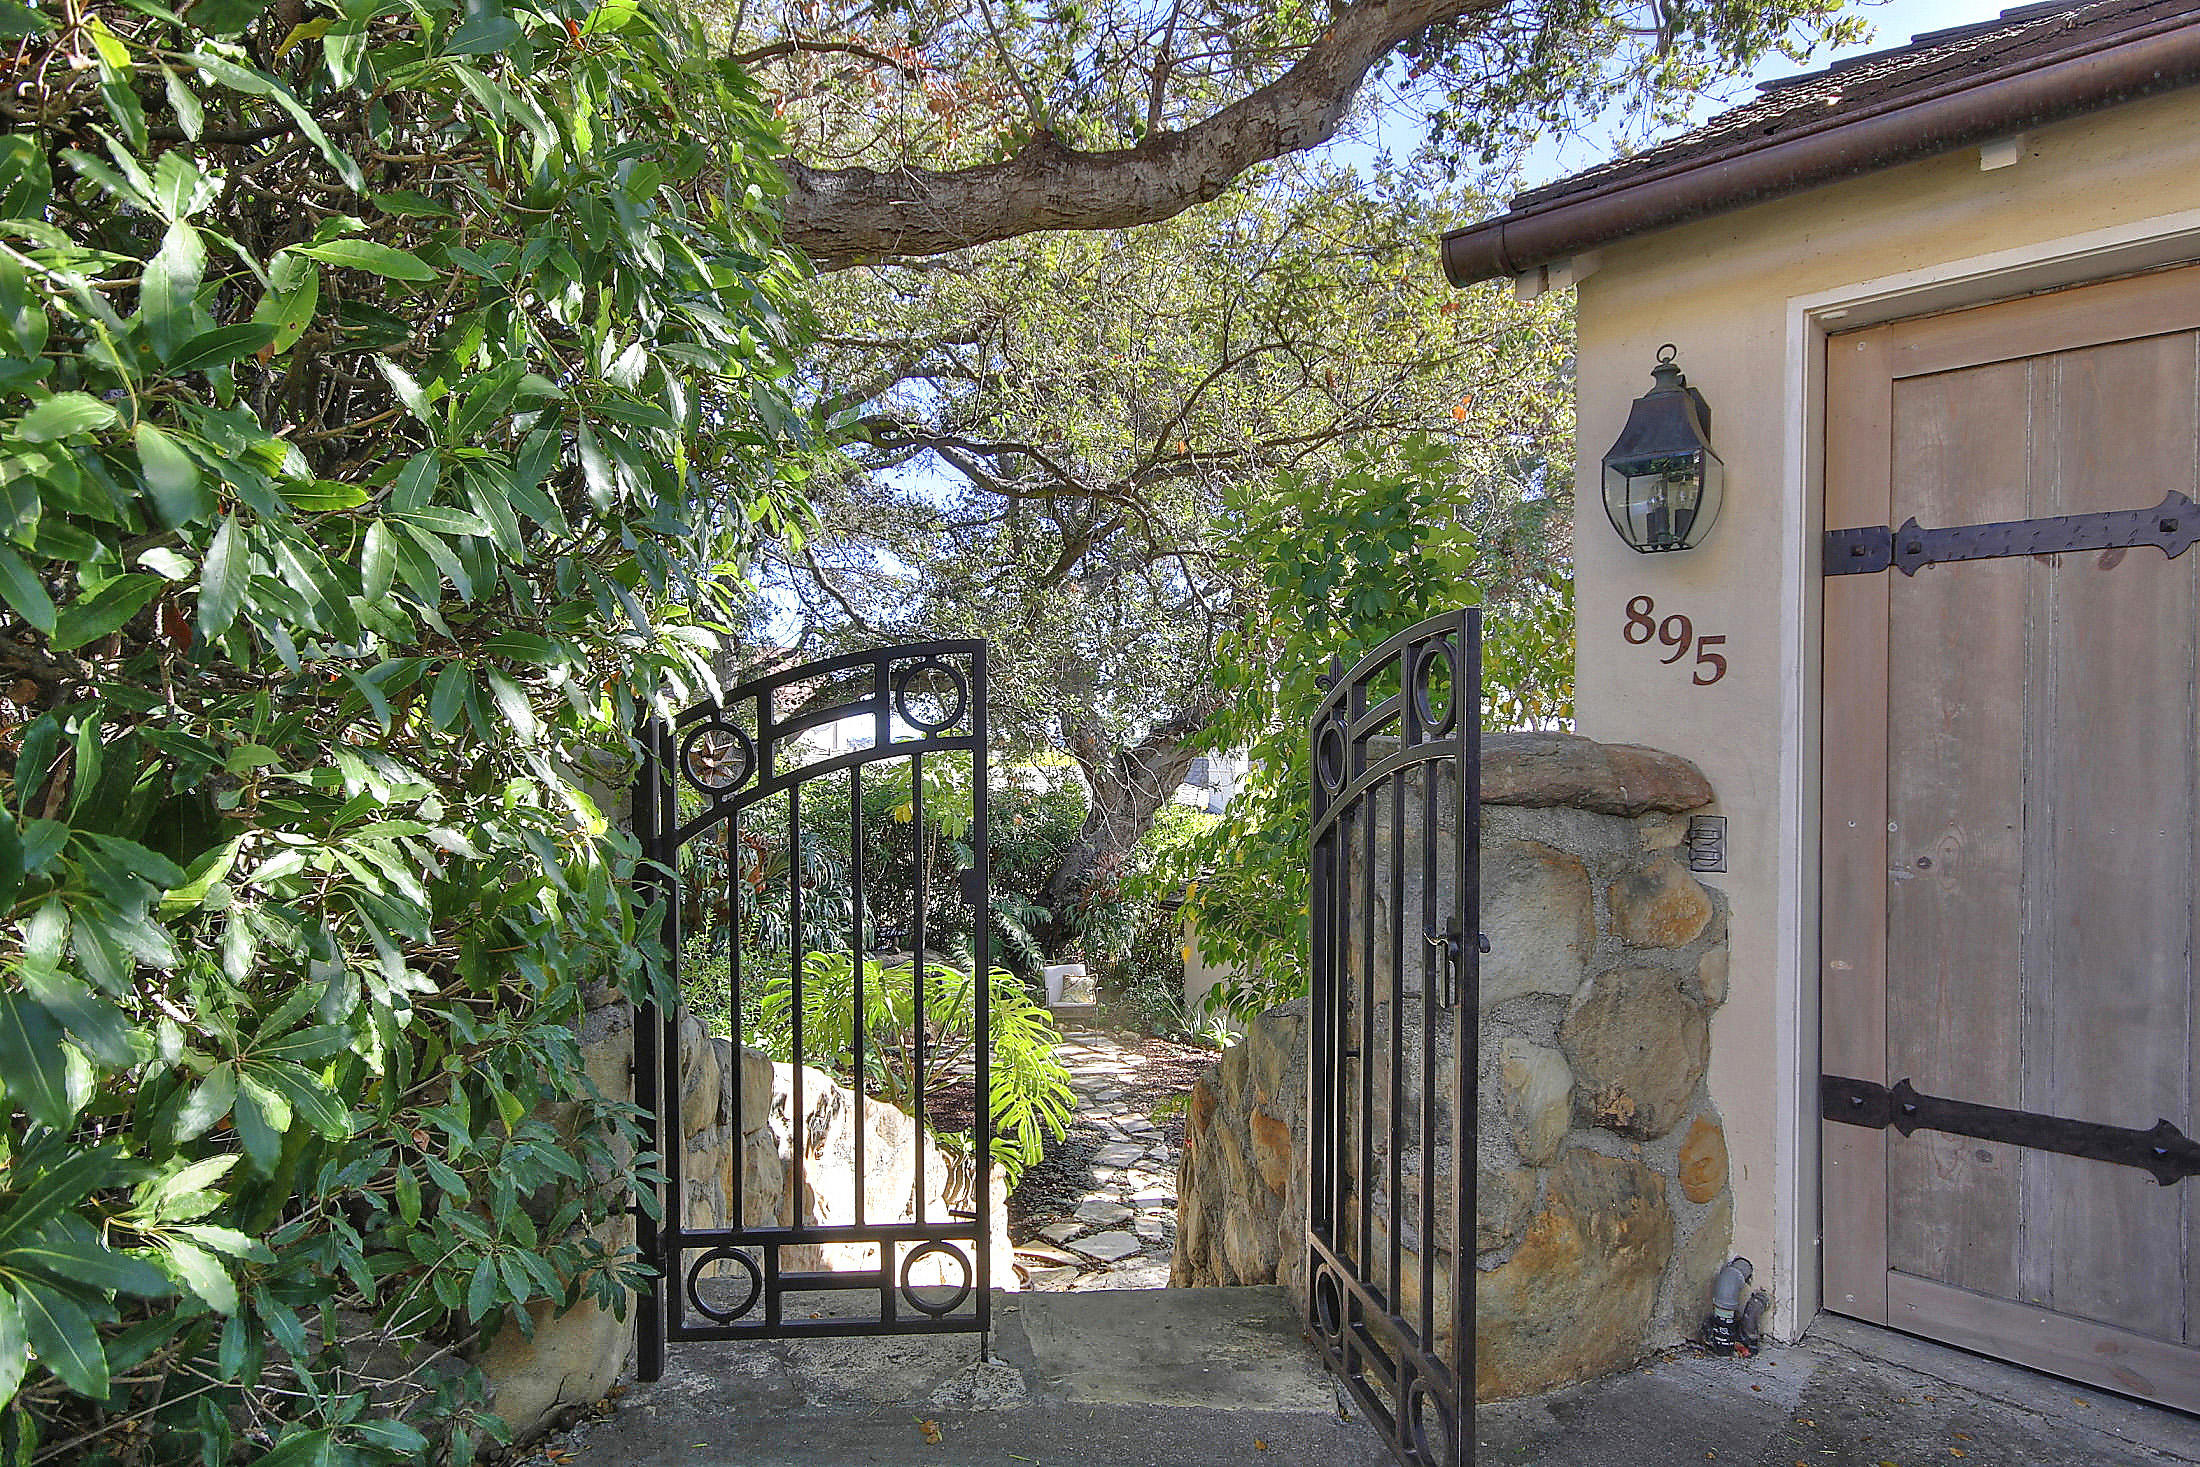 Property photo for 895 Paseo Ferrelo Santa Barbara, California 93103 - 17-1950